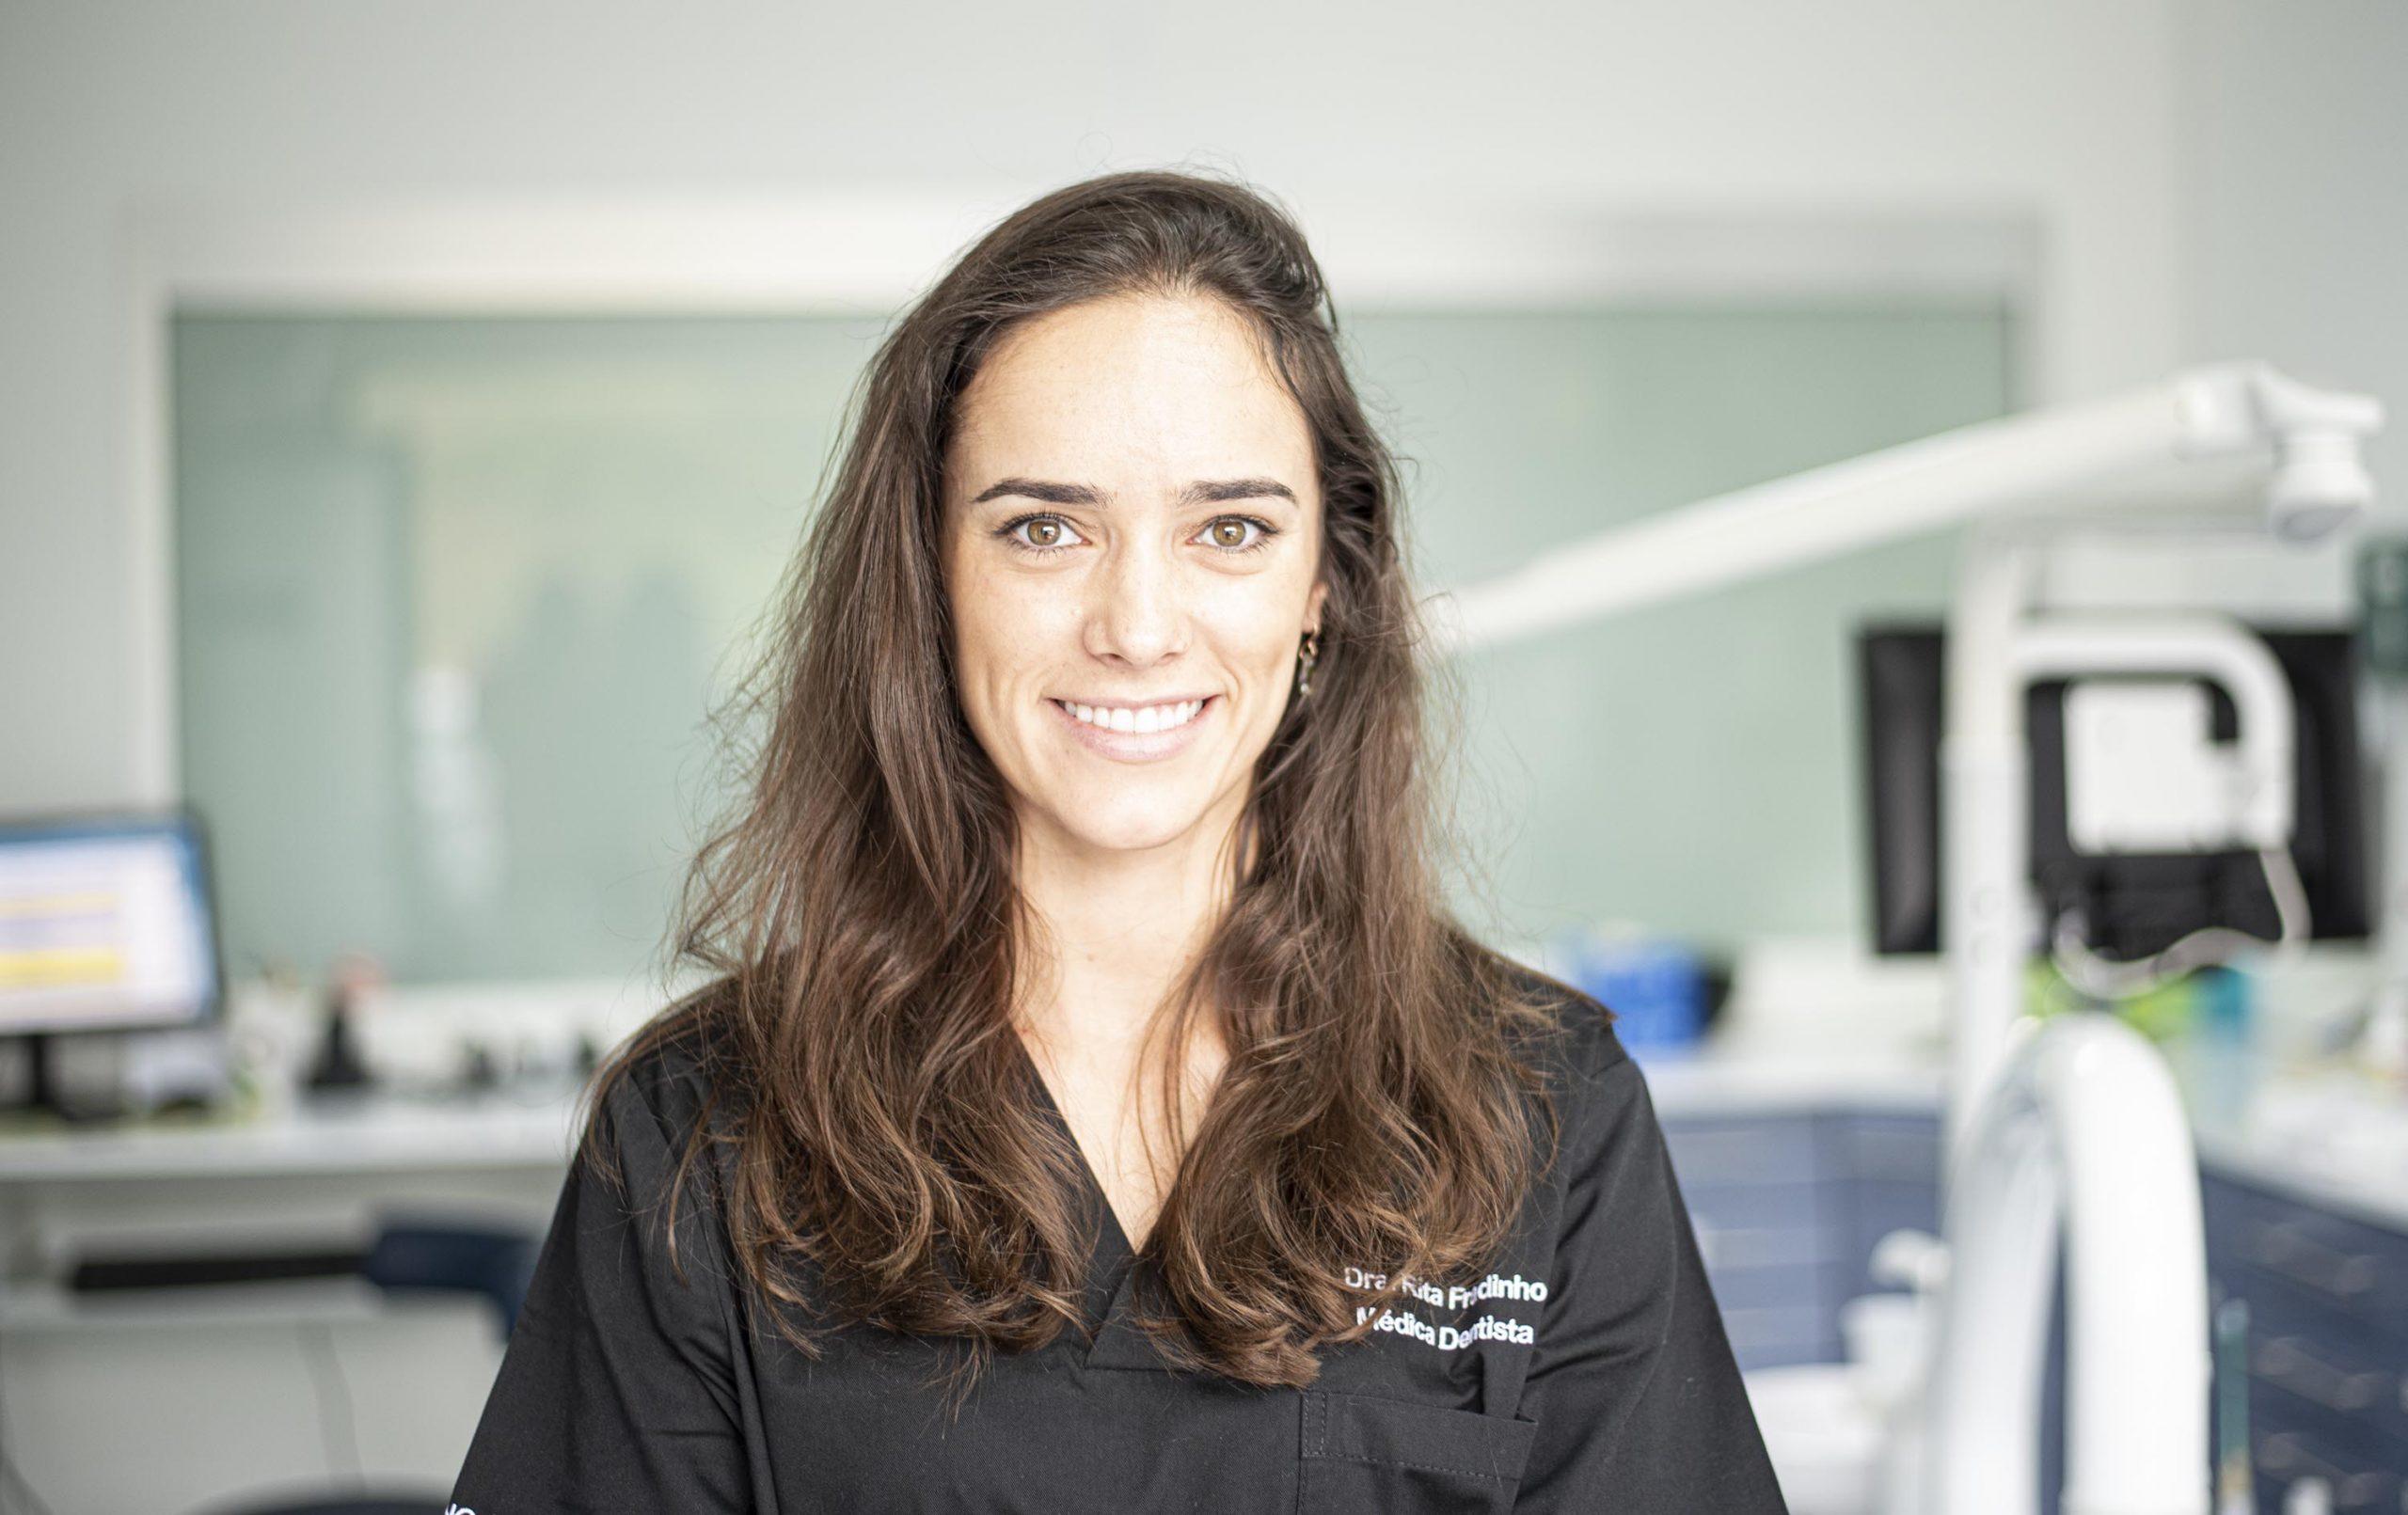 Rita Fradinho